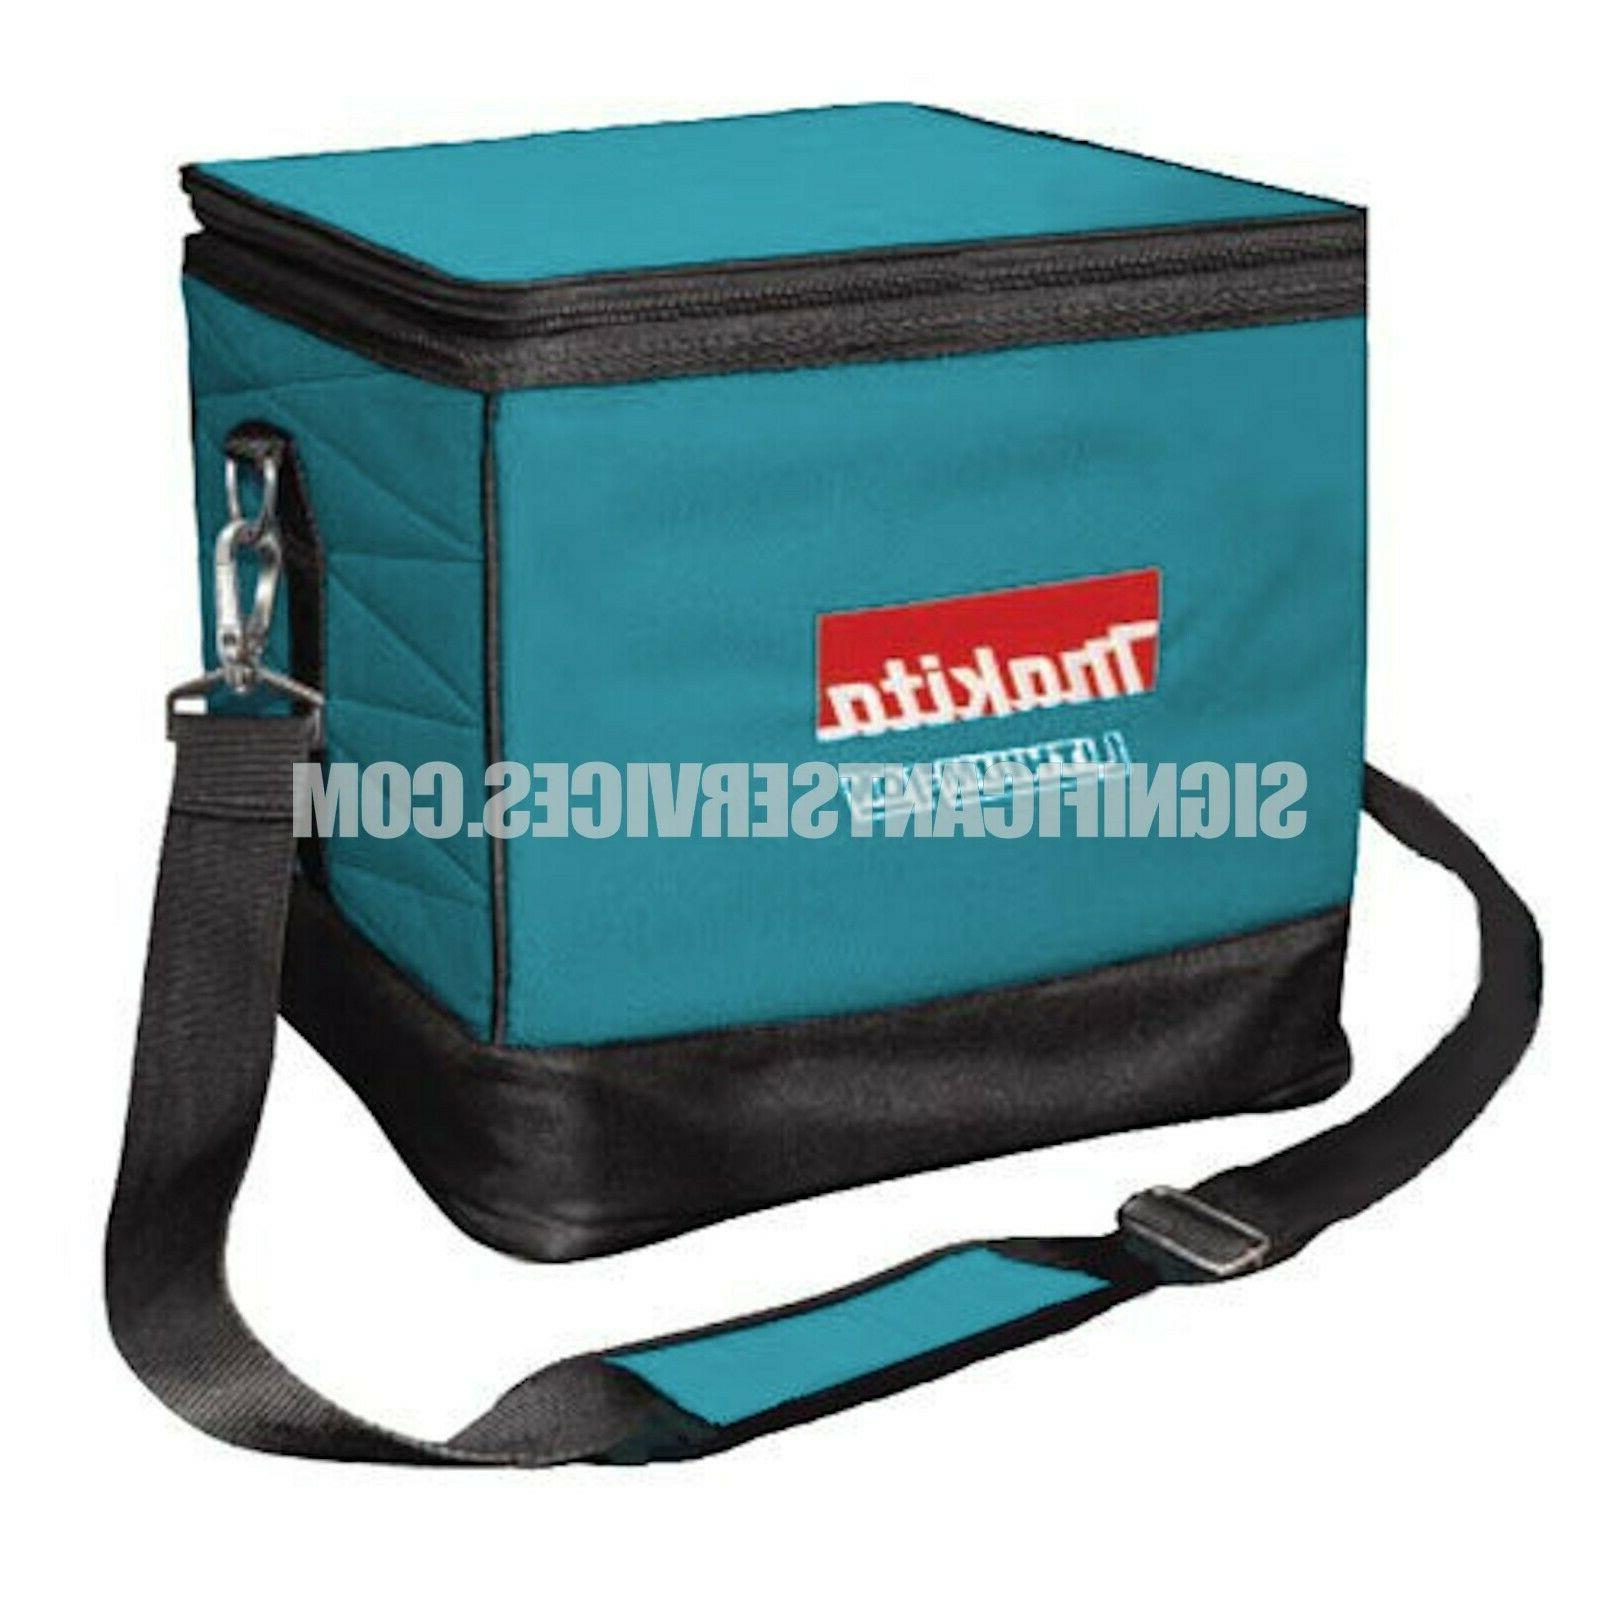 Makita 18V Duty Tool Bag Shoulder Strap